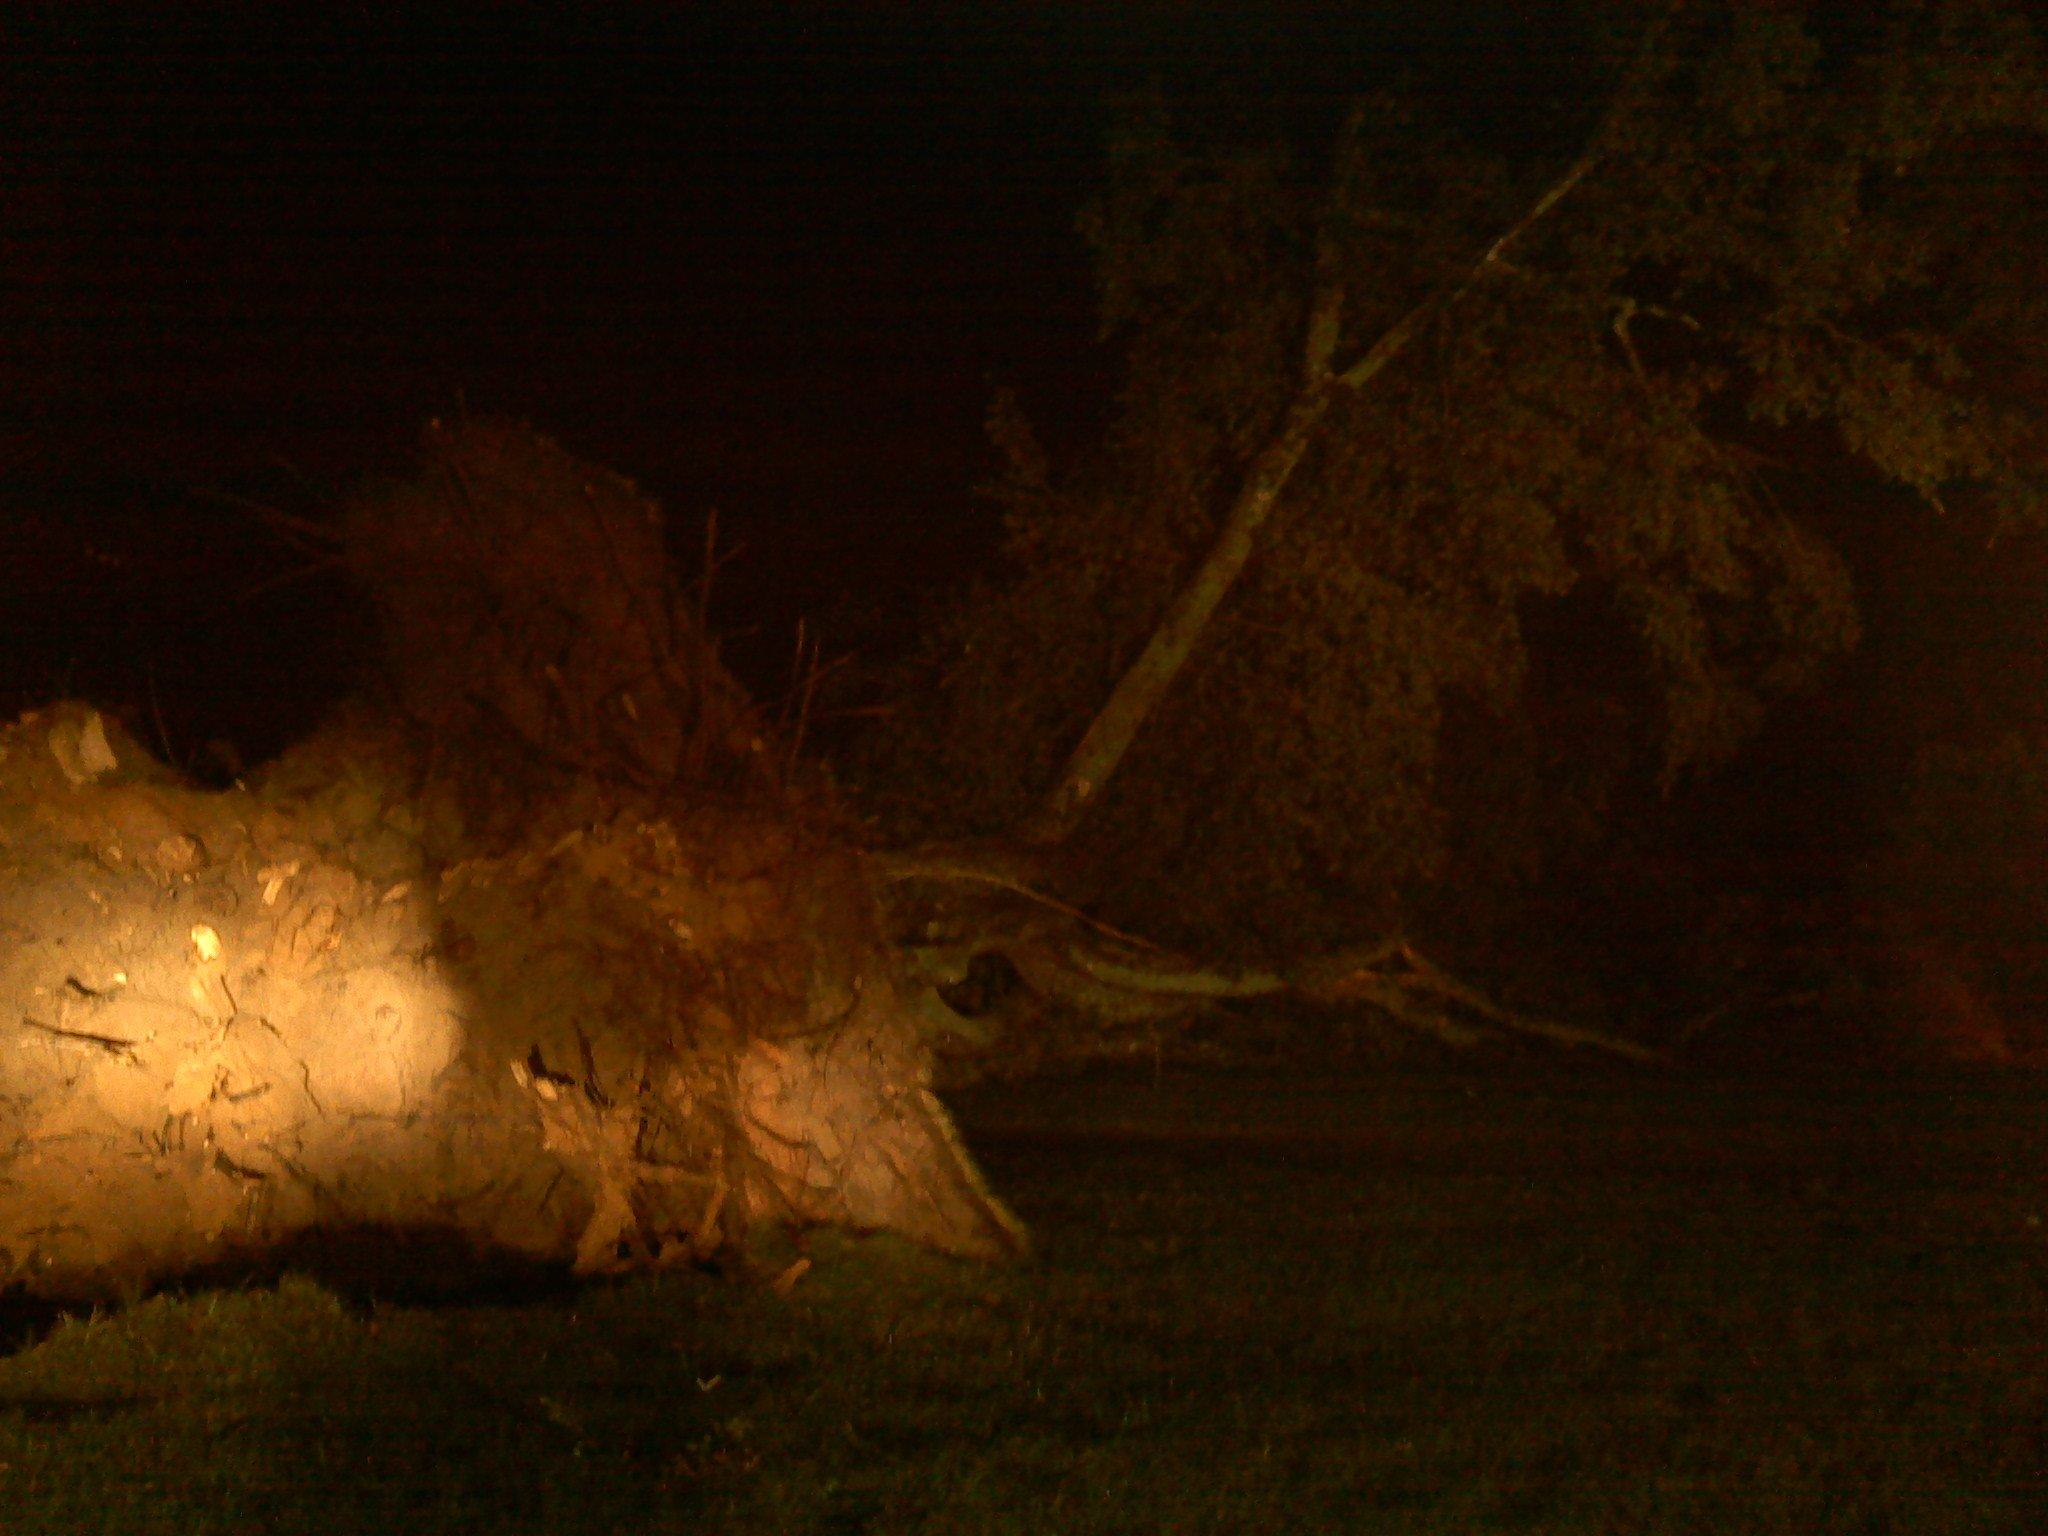 A tree fell at First Baptist Church in Belton. Photo by Mark Warren/FOX Carolina.